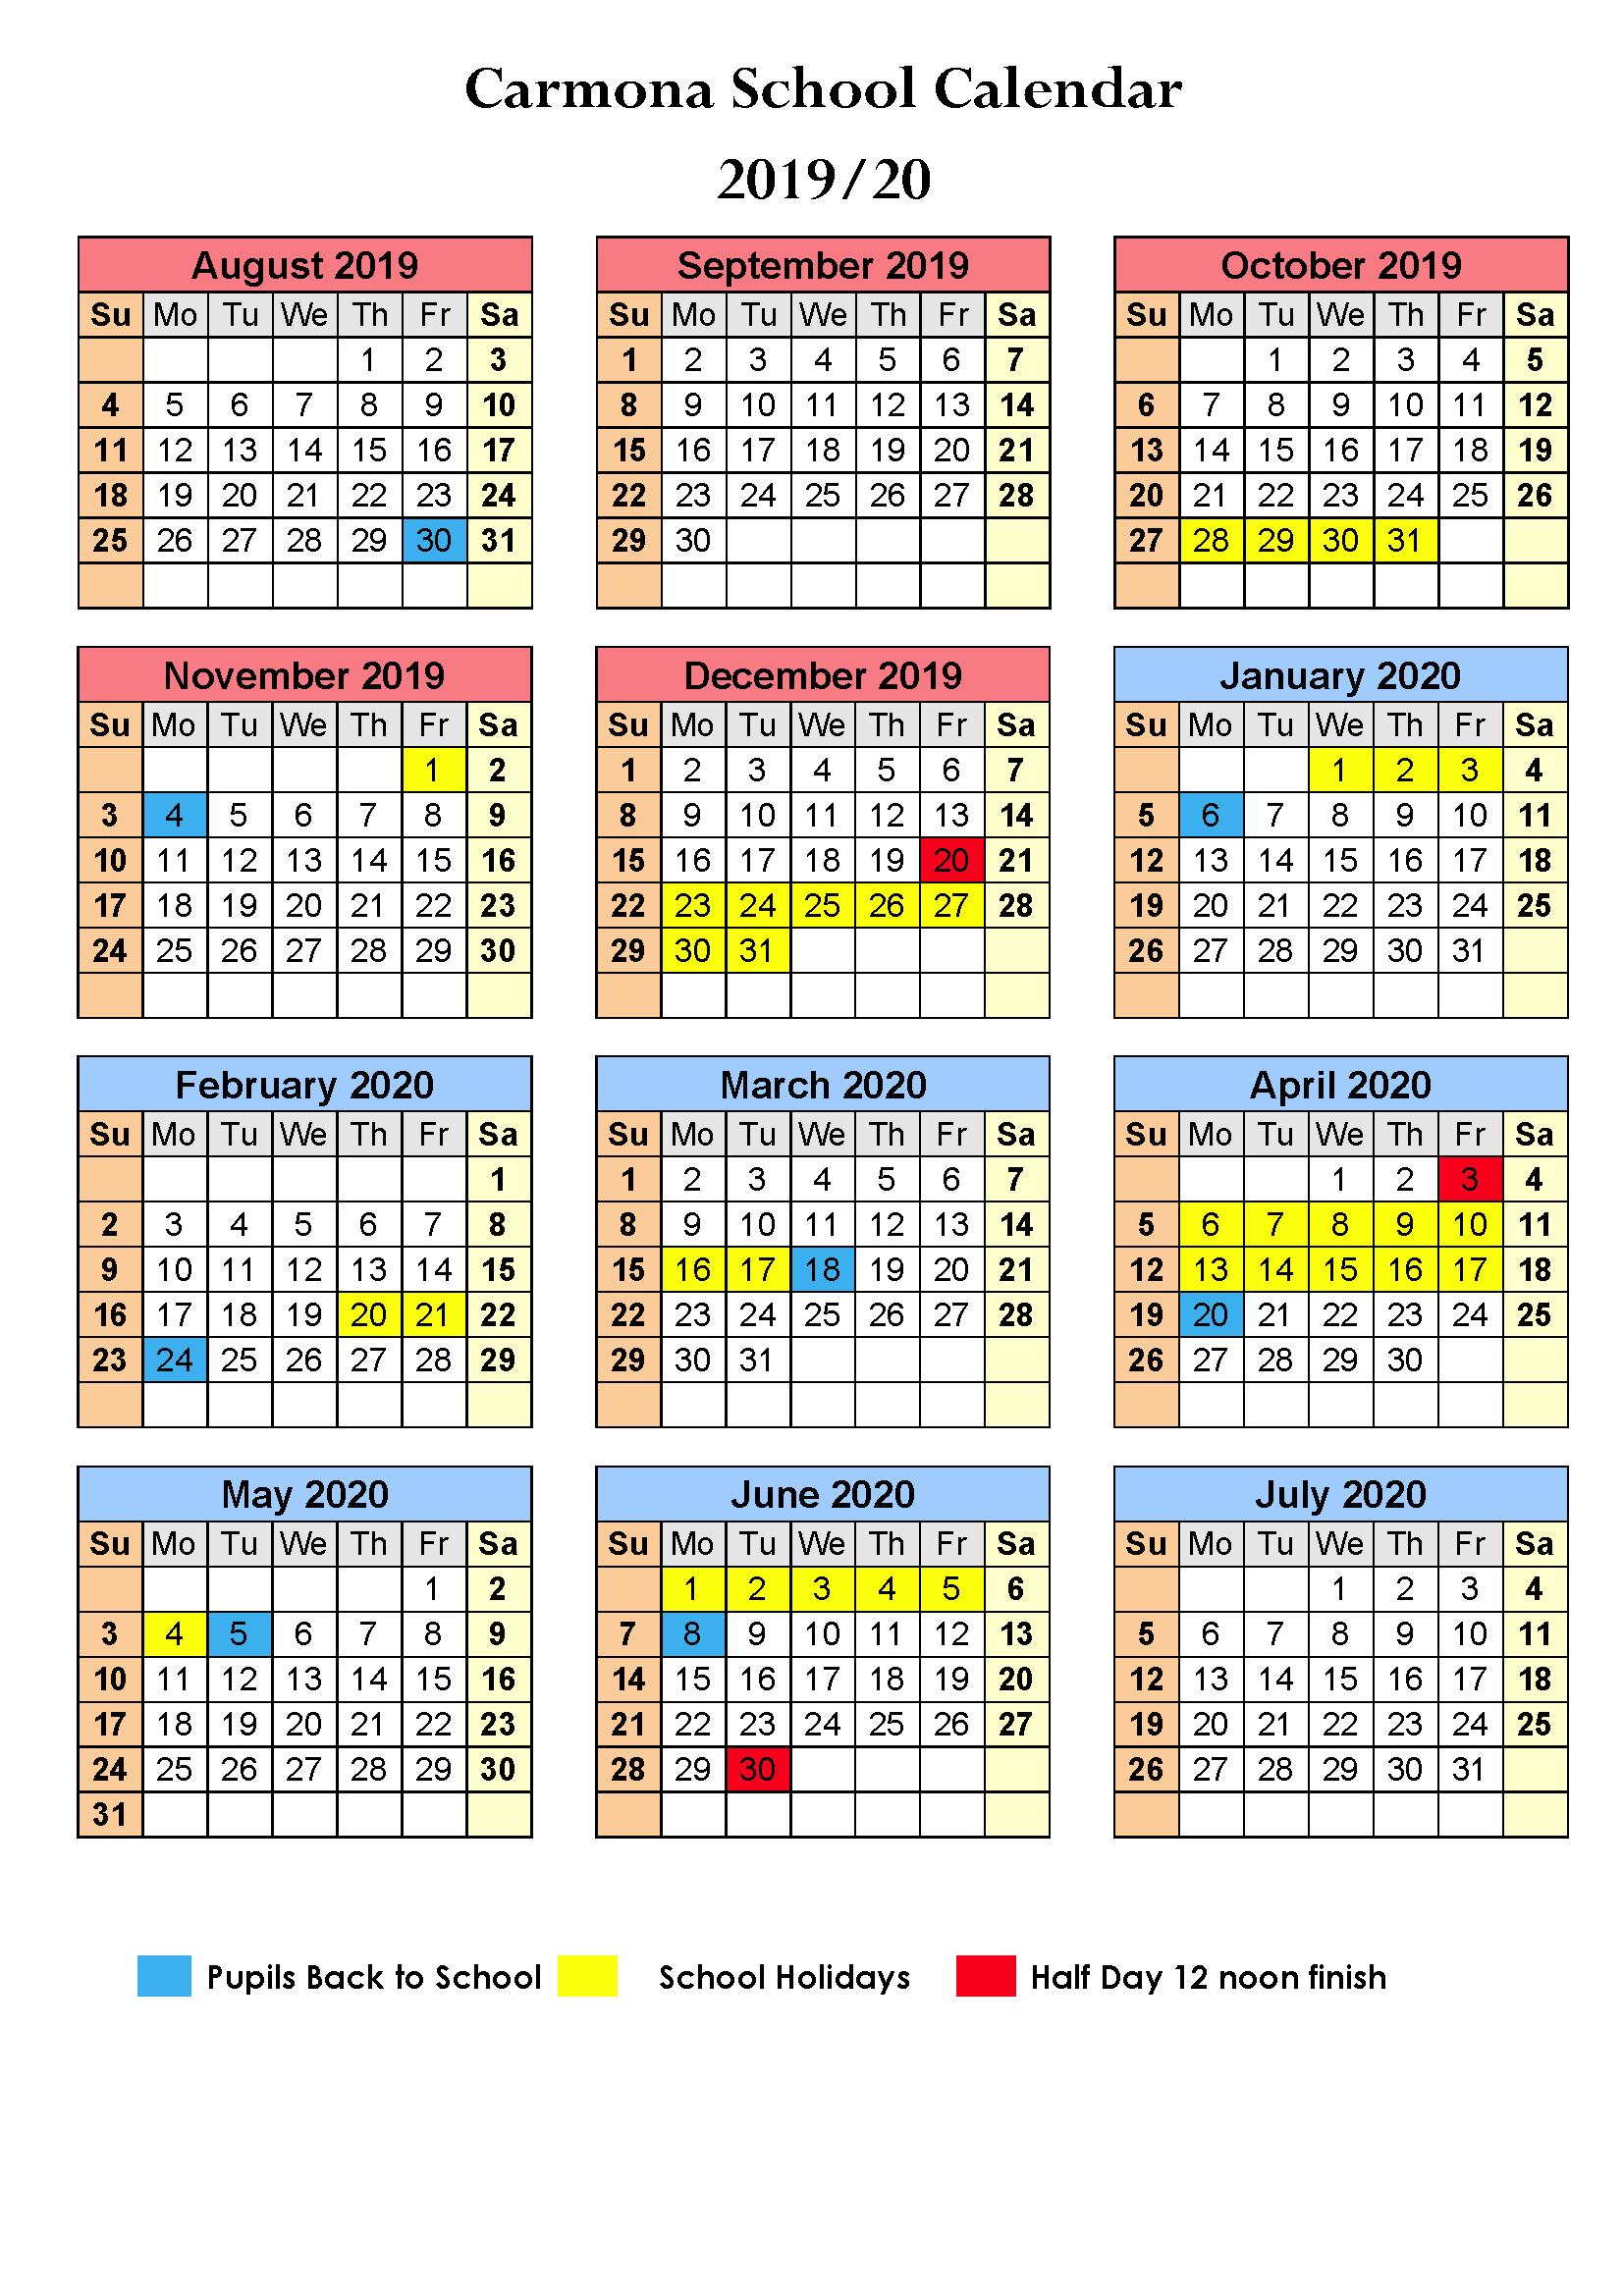 School Calendar 2019/2020 - Carmona School